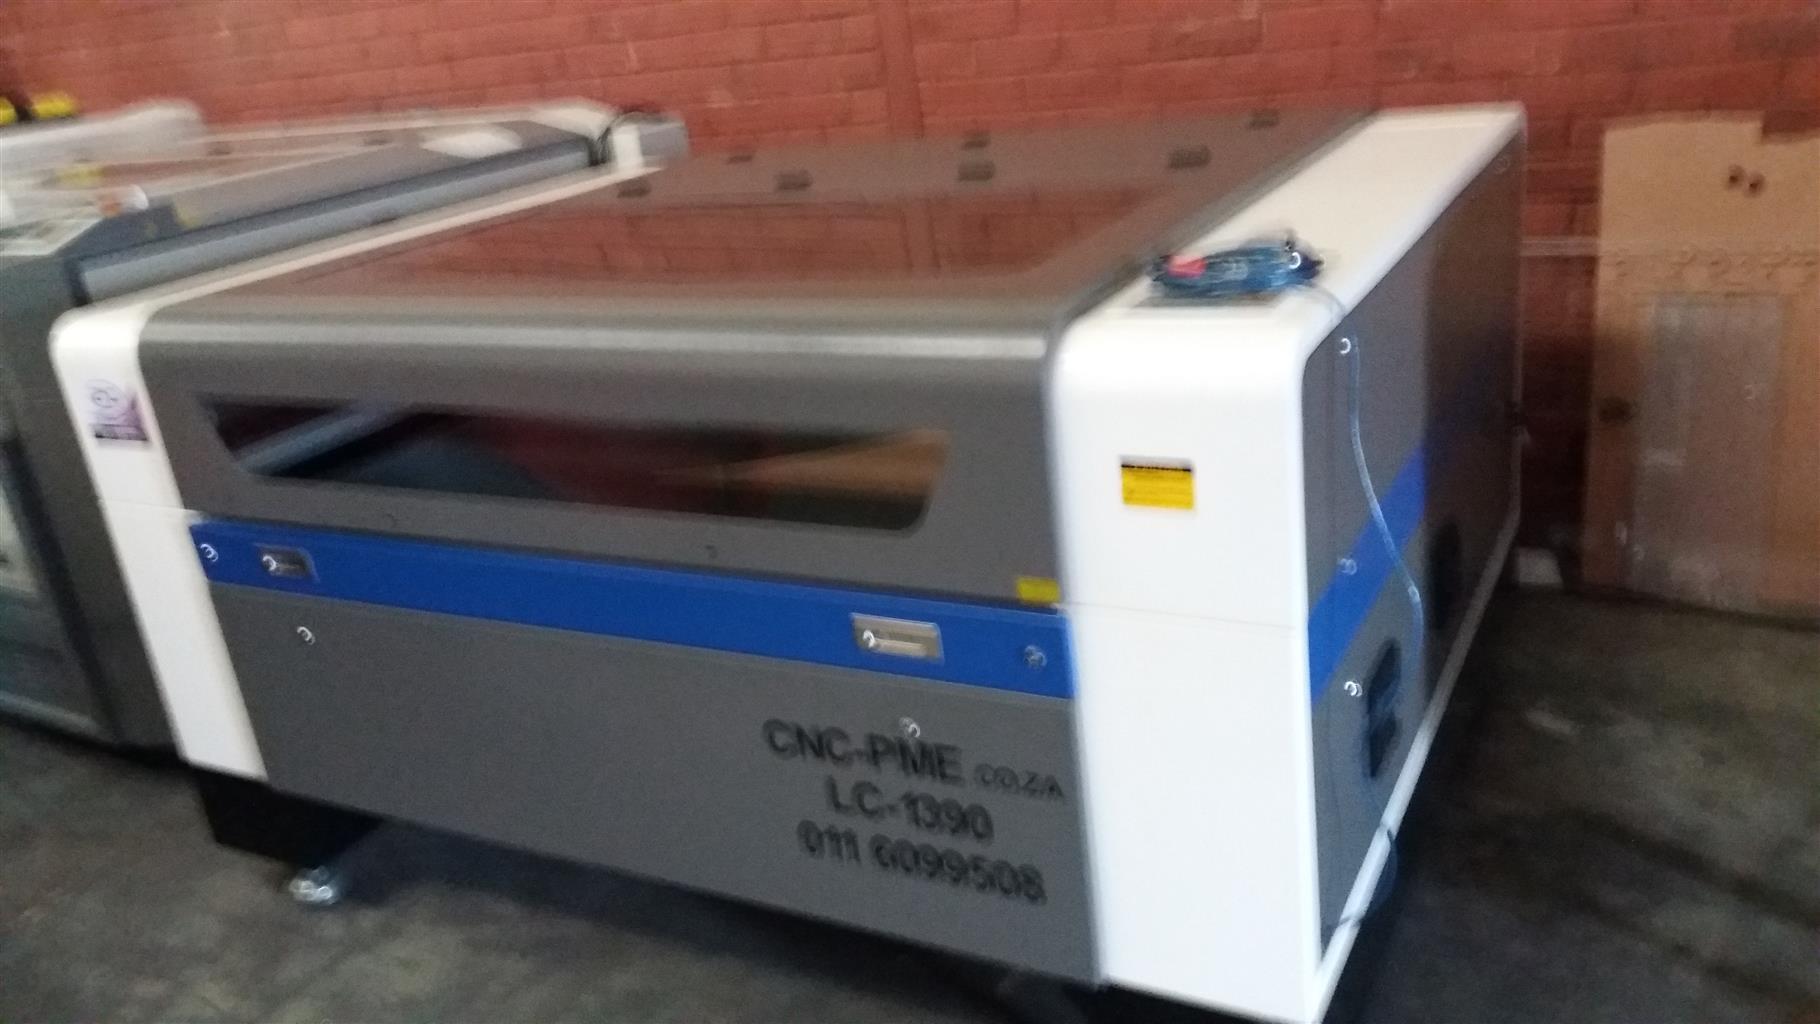 kl 1.3mx900mmx100/130w up/down table autofocus laser head